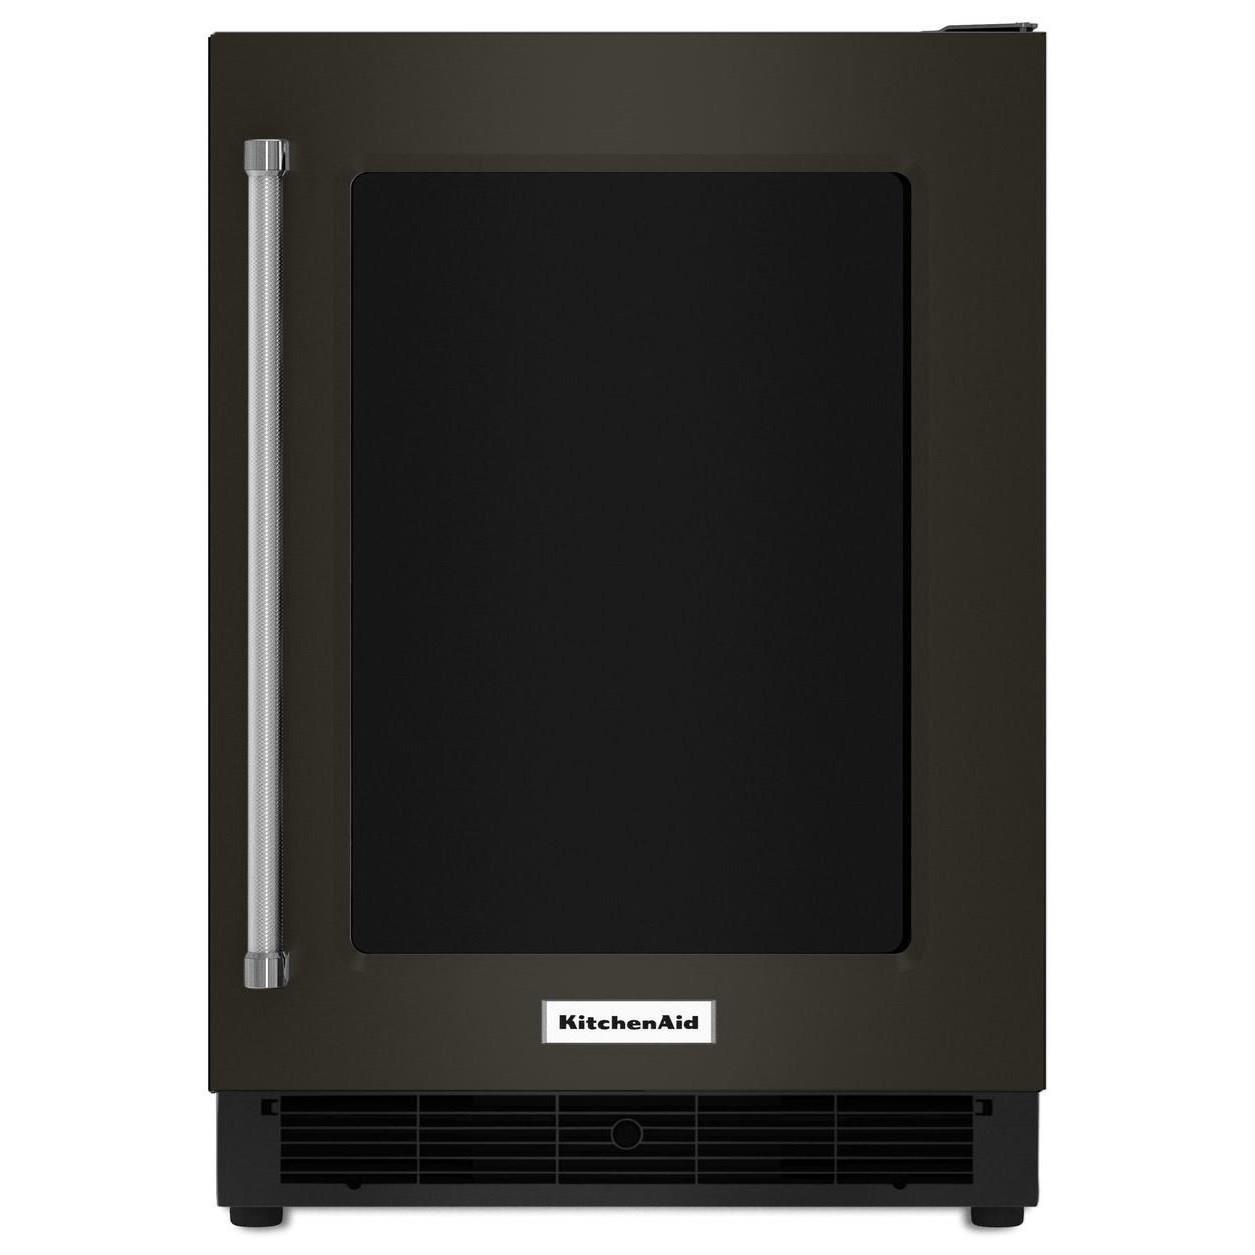 "KitchenAid Beverage Coolers - KitchenAid 24"" Undercounter Right Hand PullRefrigerator - Item Number: KURR304EBS"